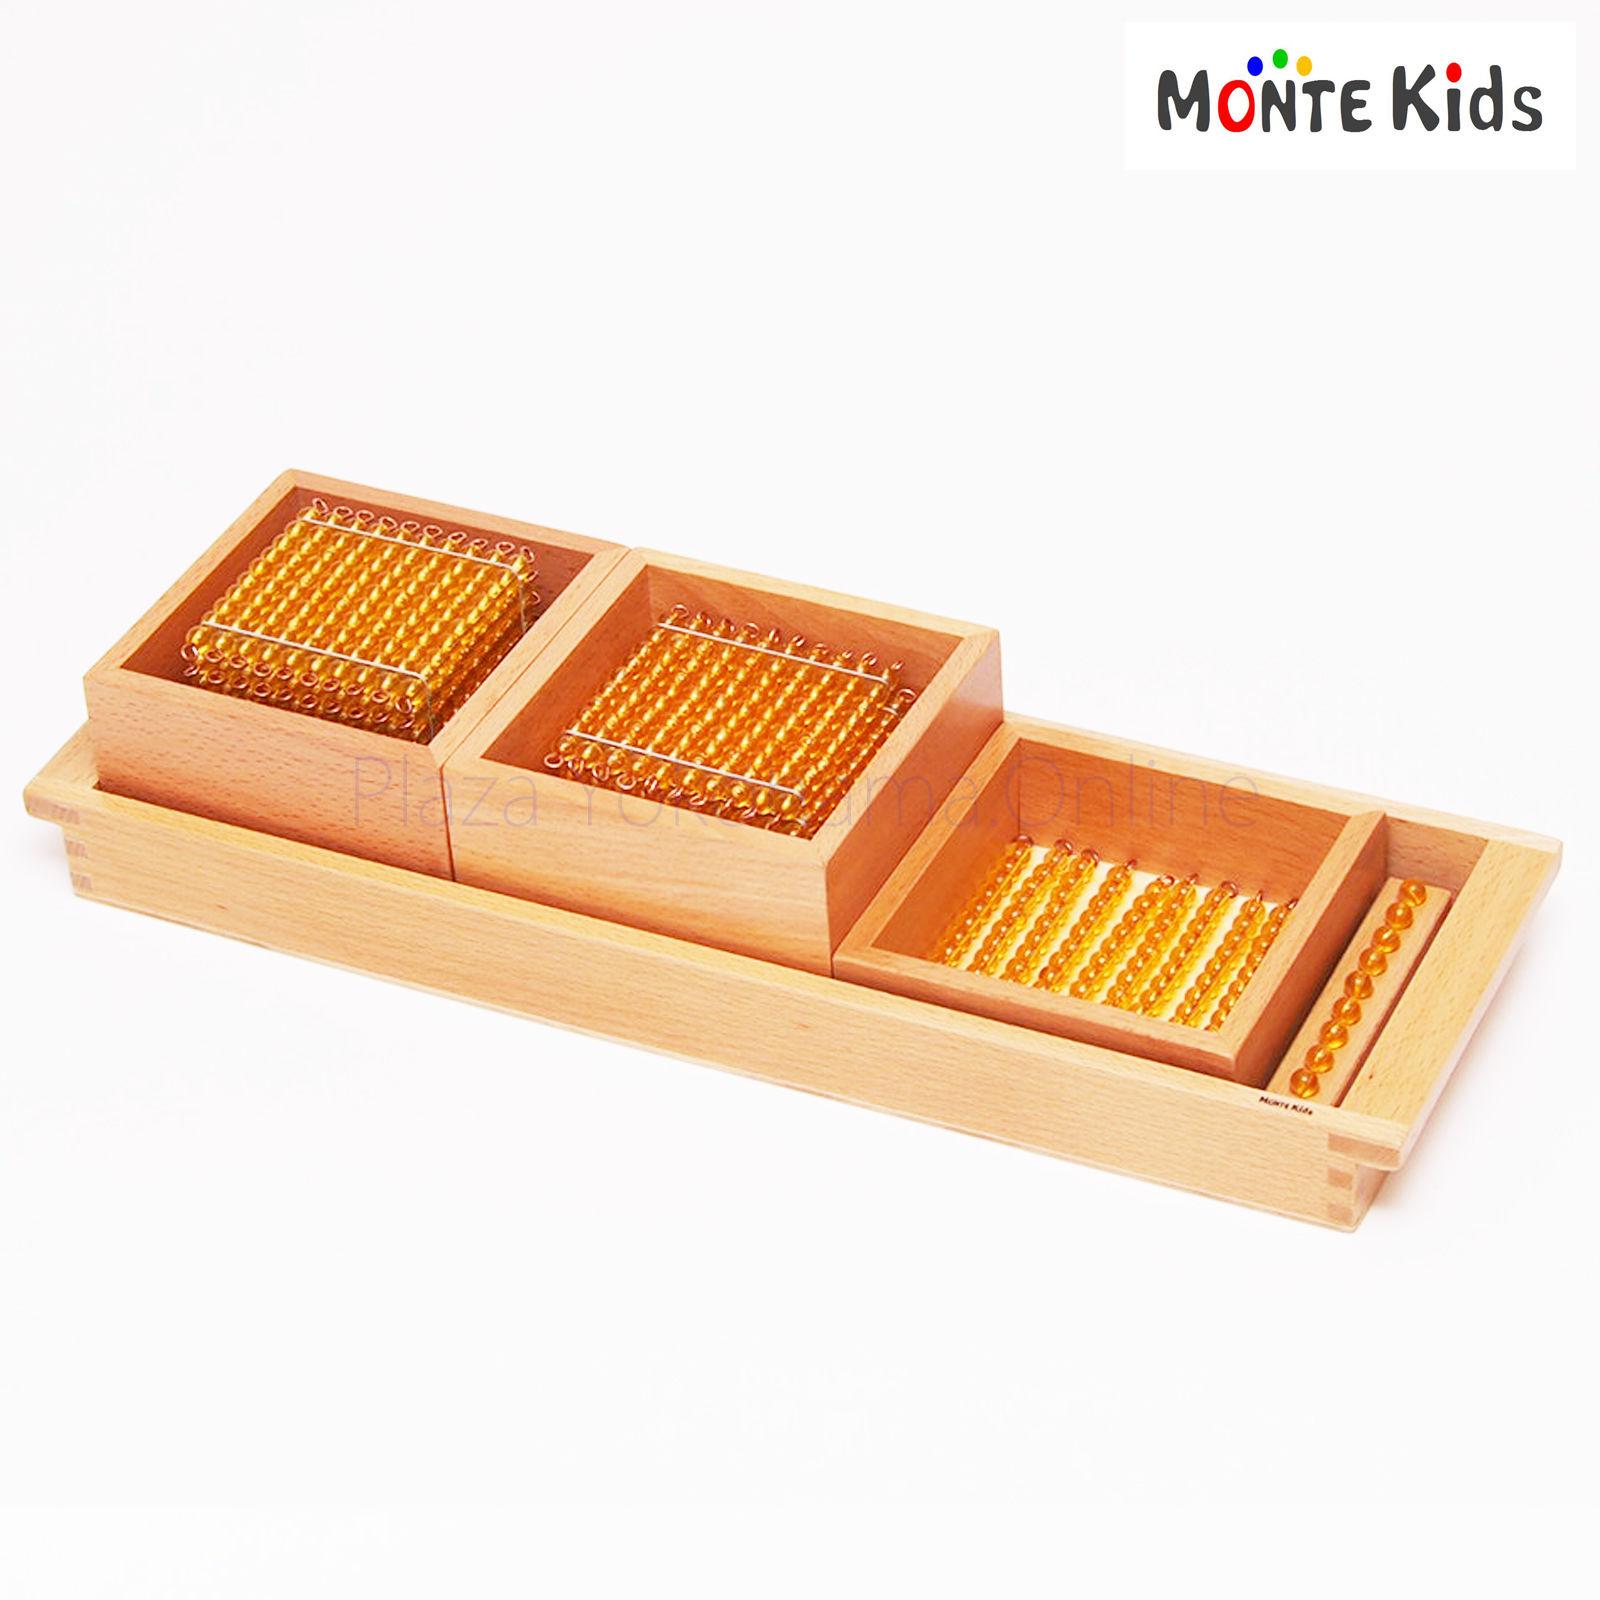 【MONTE Kids】MK-003  十進法 1-1000の金ビーズ  ≪OUTLET≫